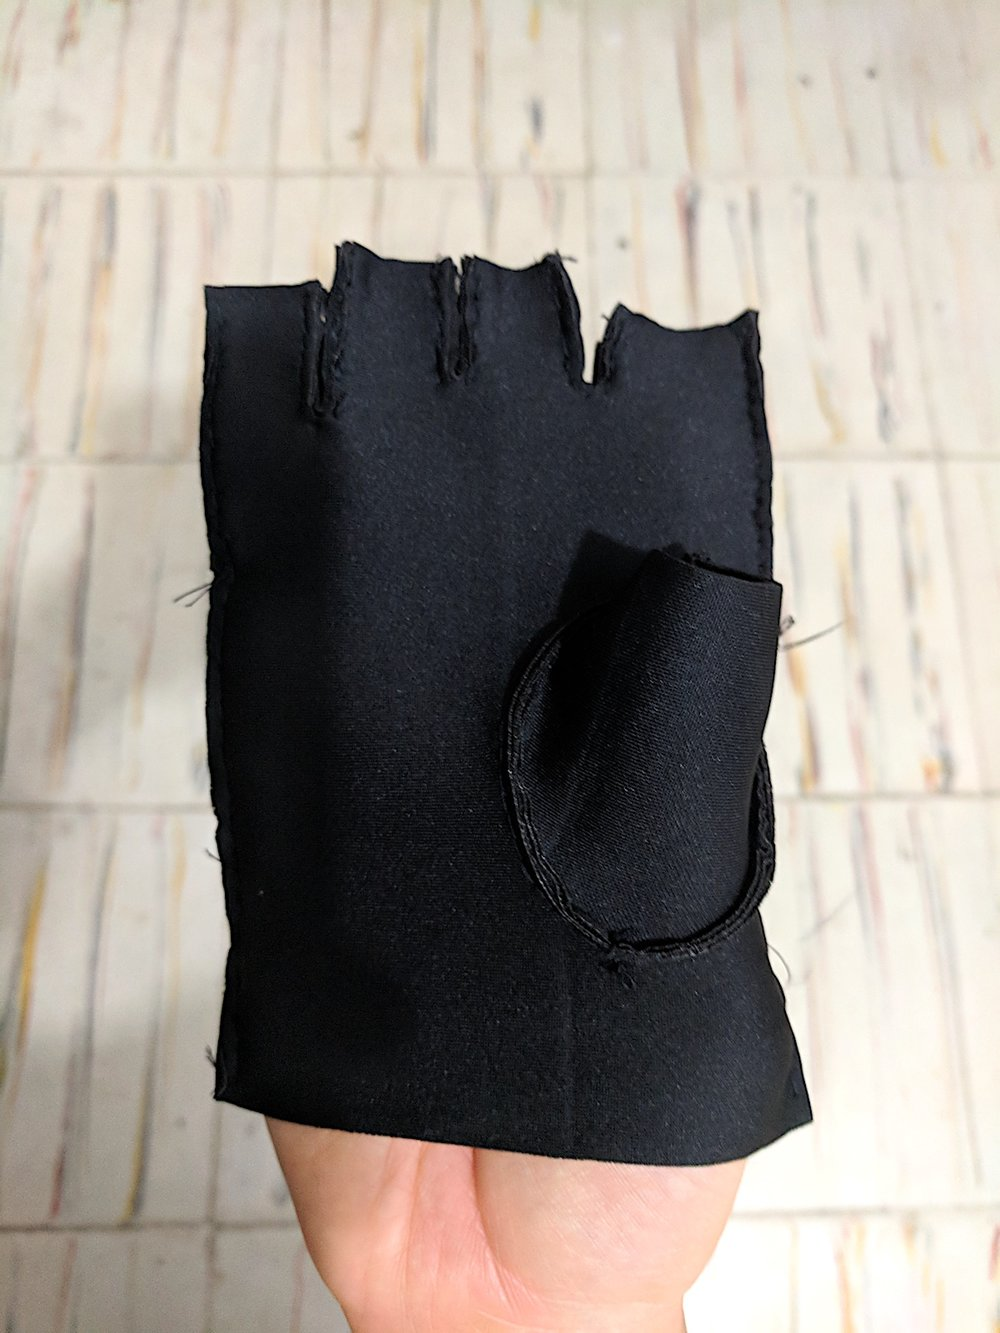 W12_glove inside out.jpg